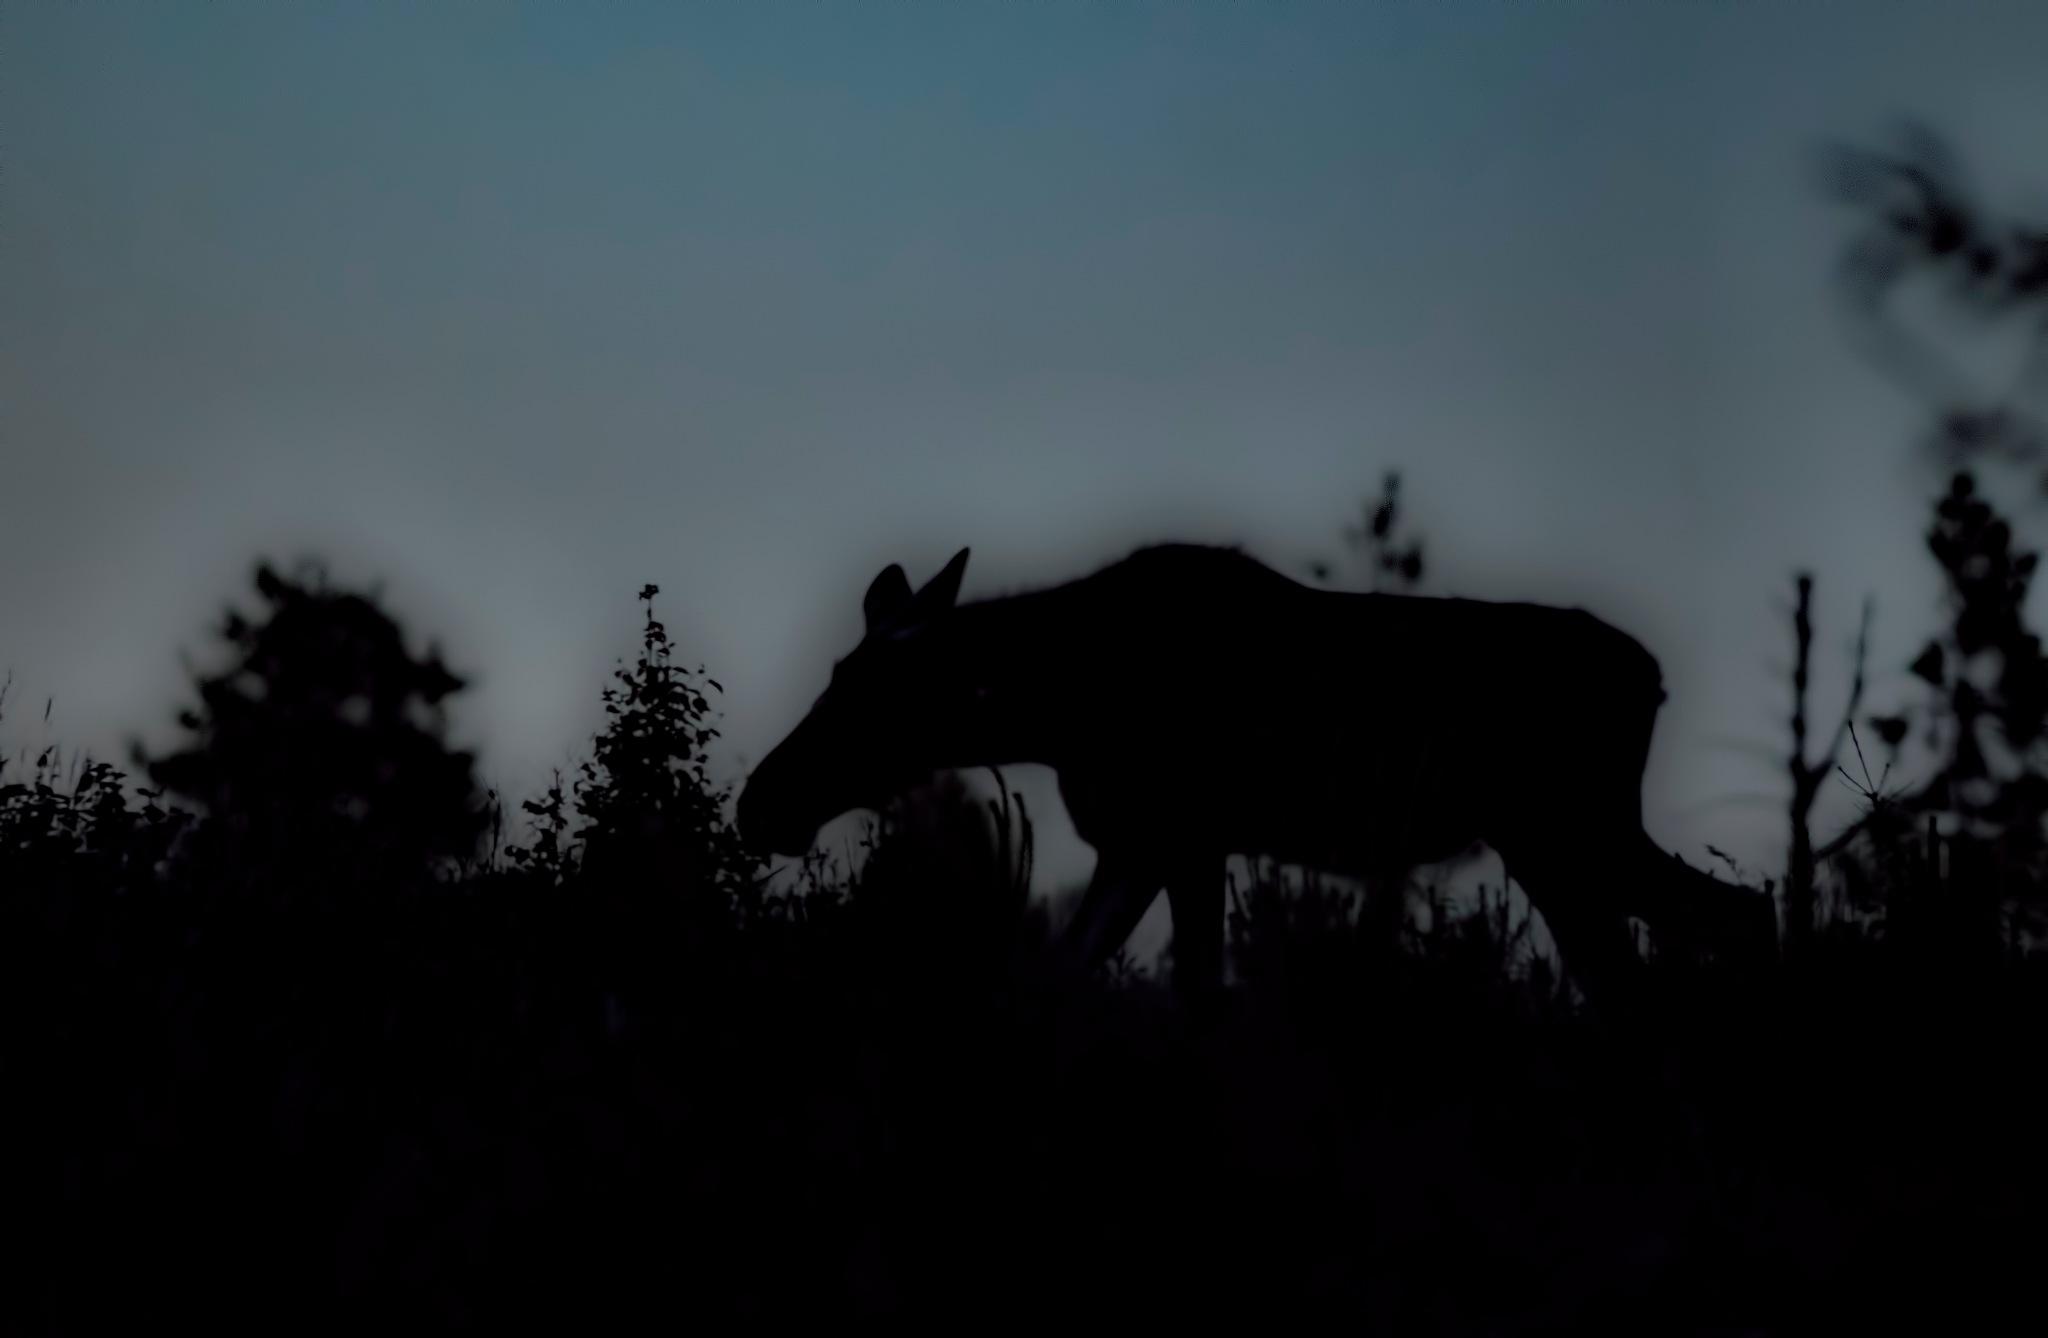 Shadows by Jörgen Lindgren